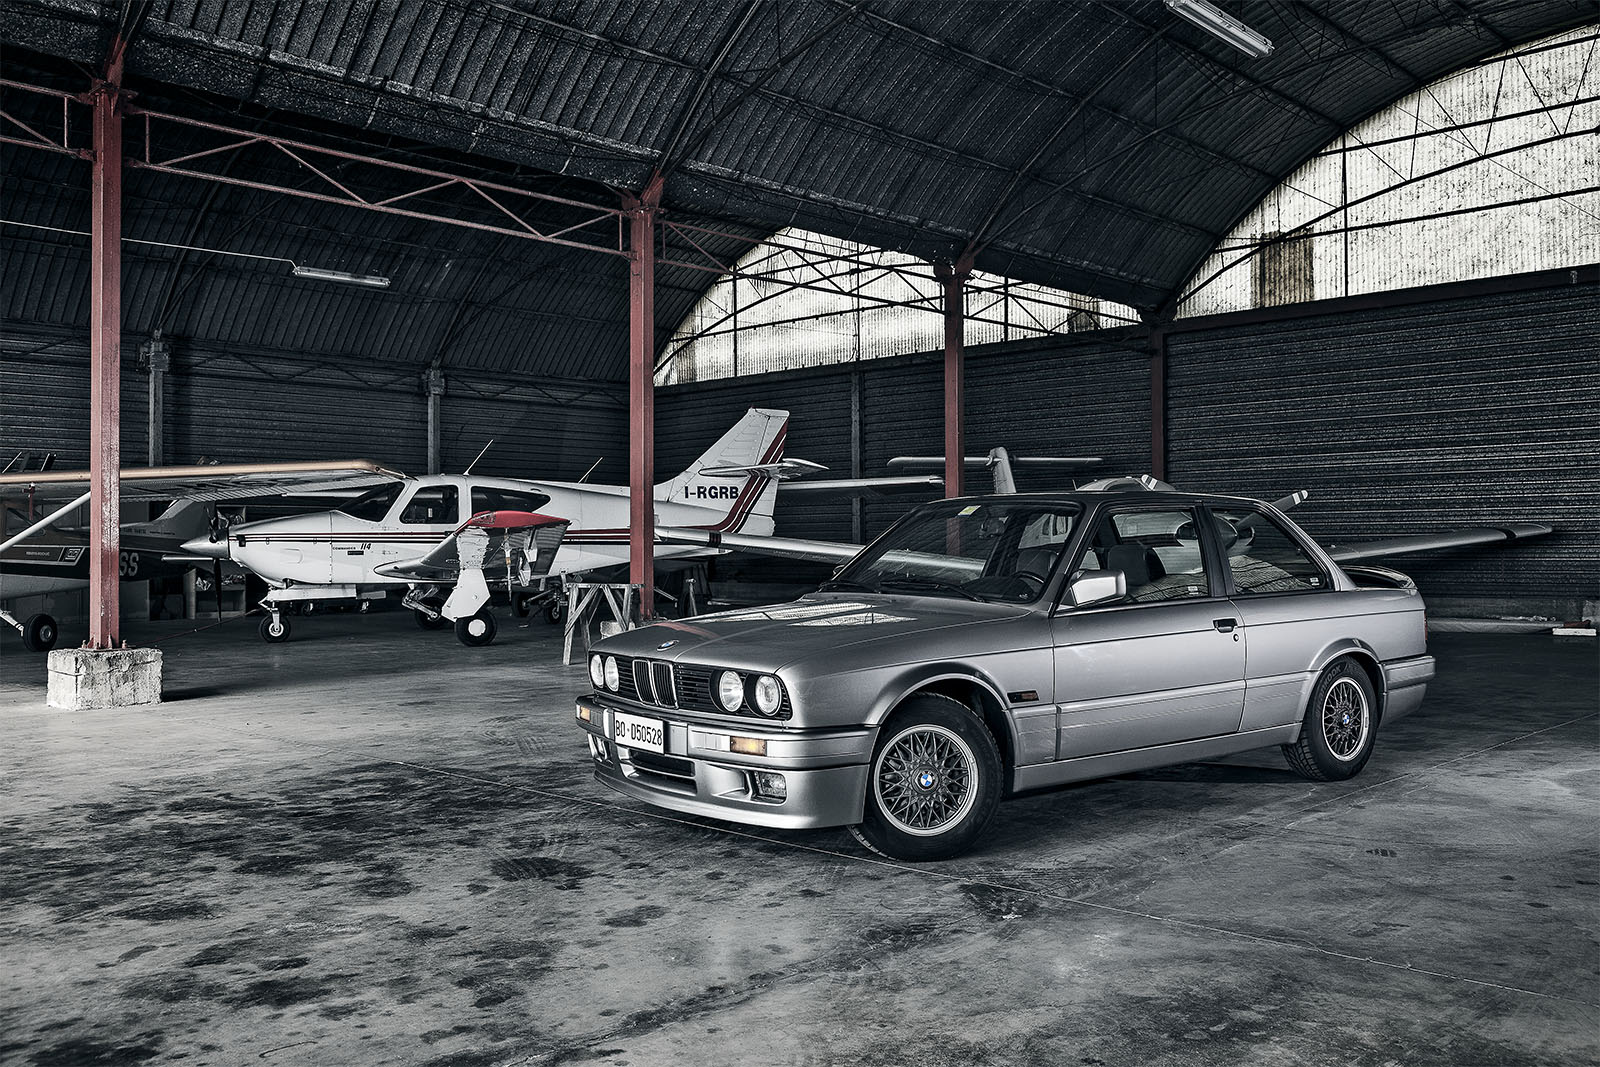 BMW_M3_1983_vintage_aitport_modena